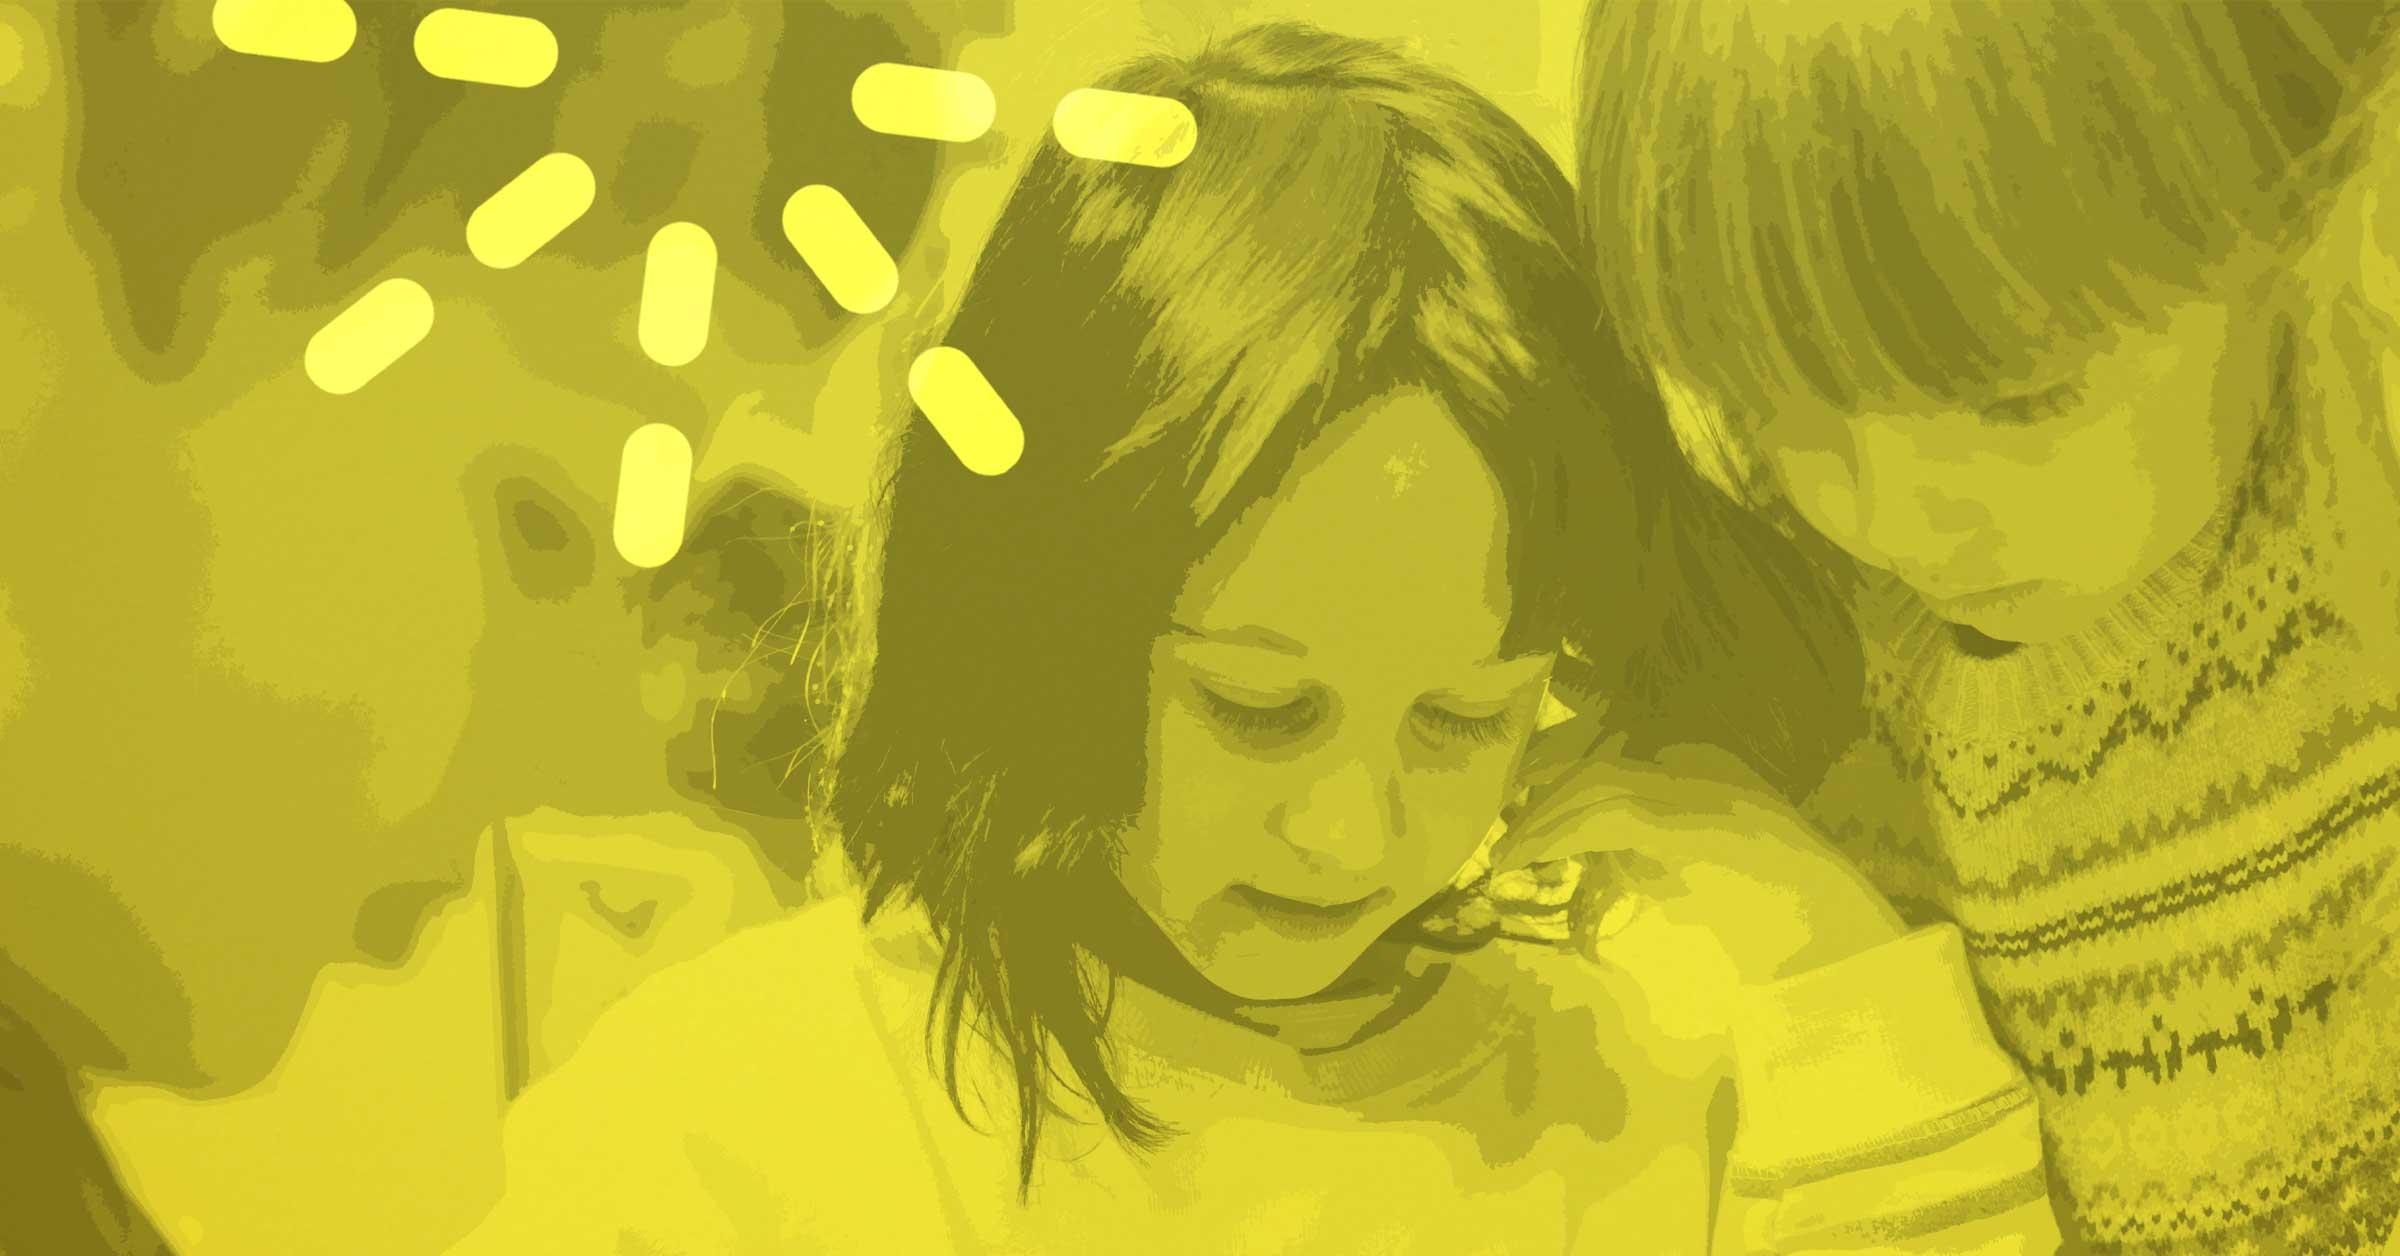 Preschool Worship 7 Ways to Make It Count